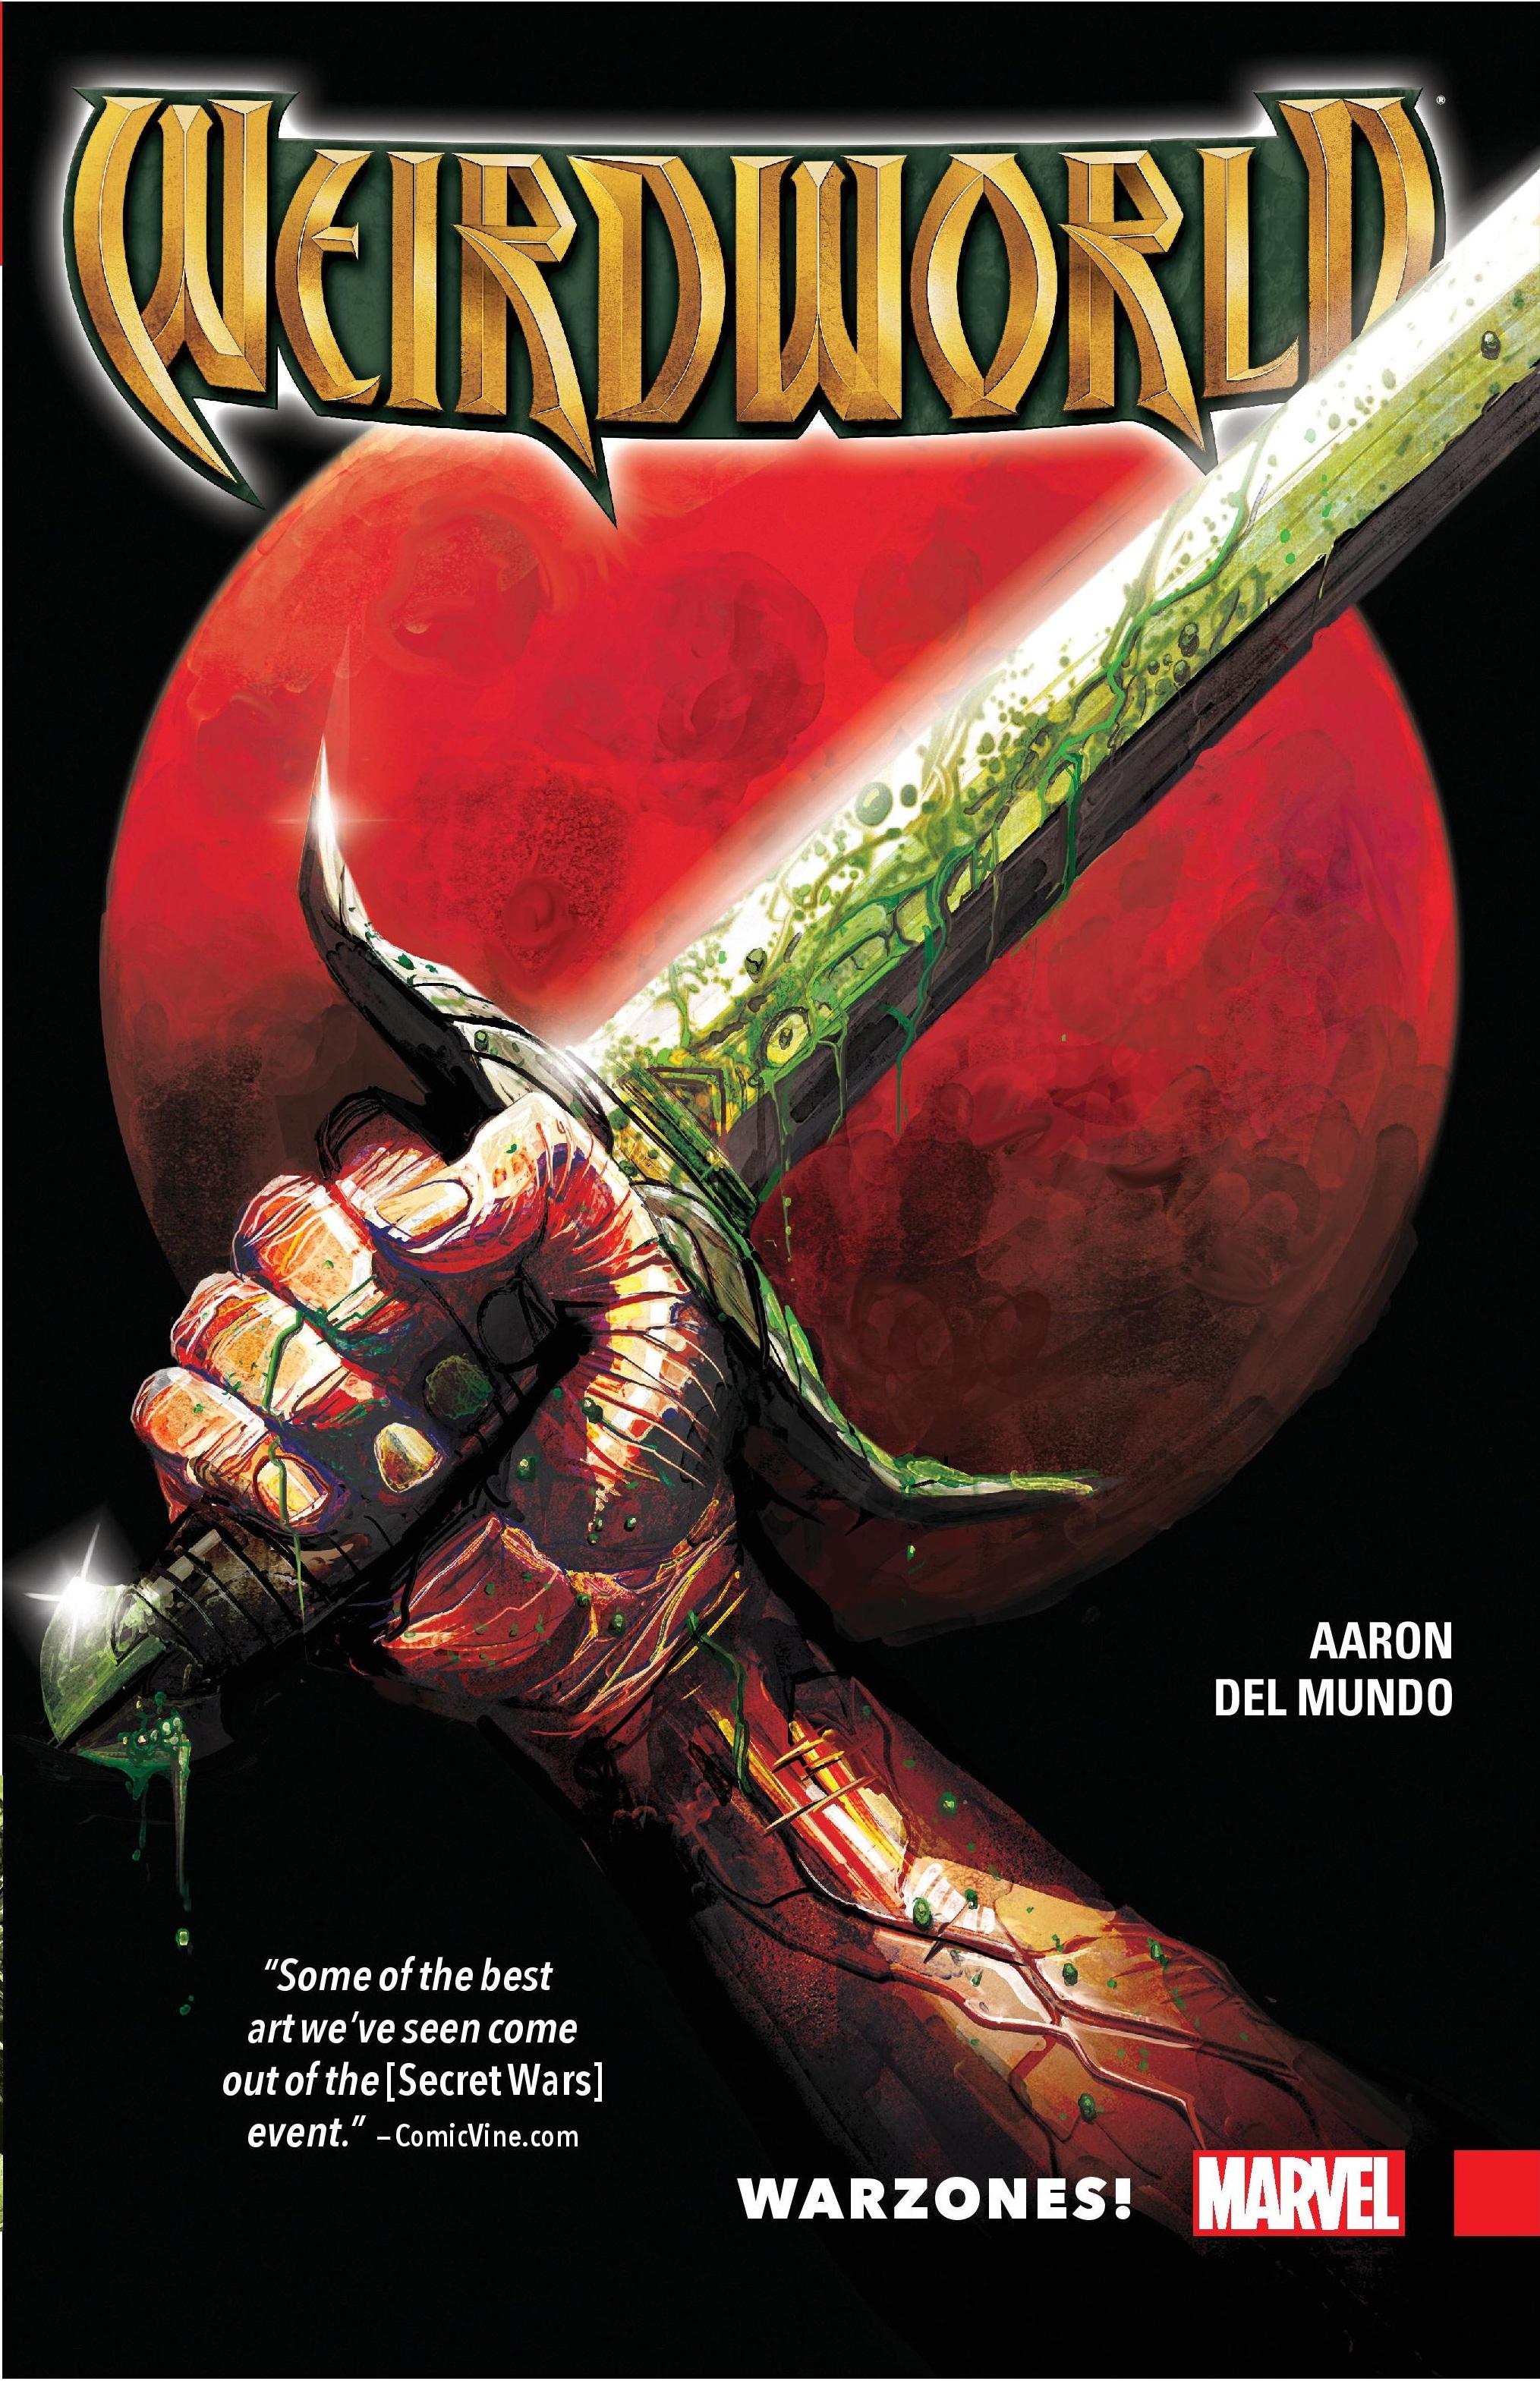 Weirdworld Vol. 0: Warzones! (Trade Paperback)